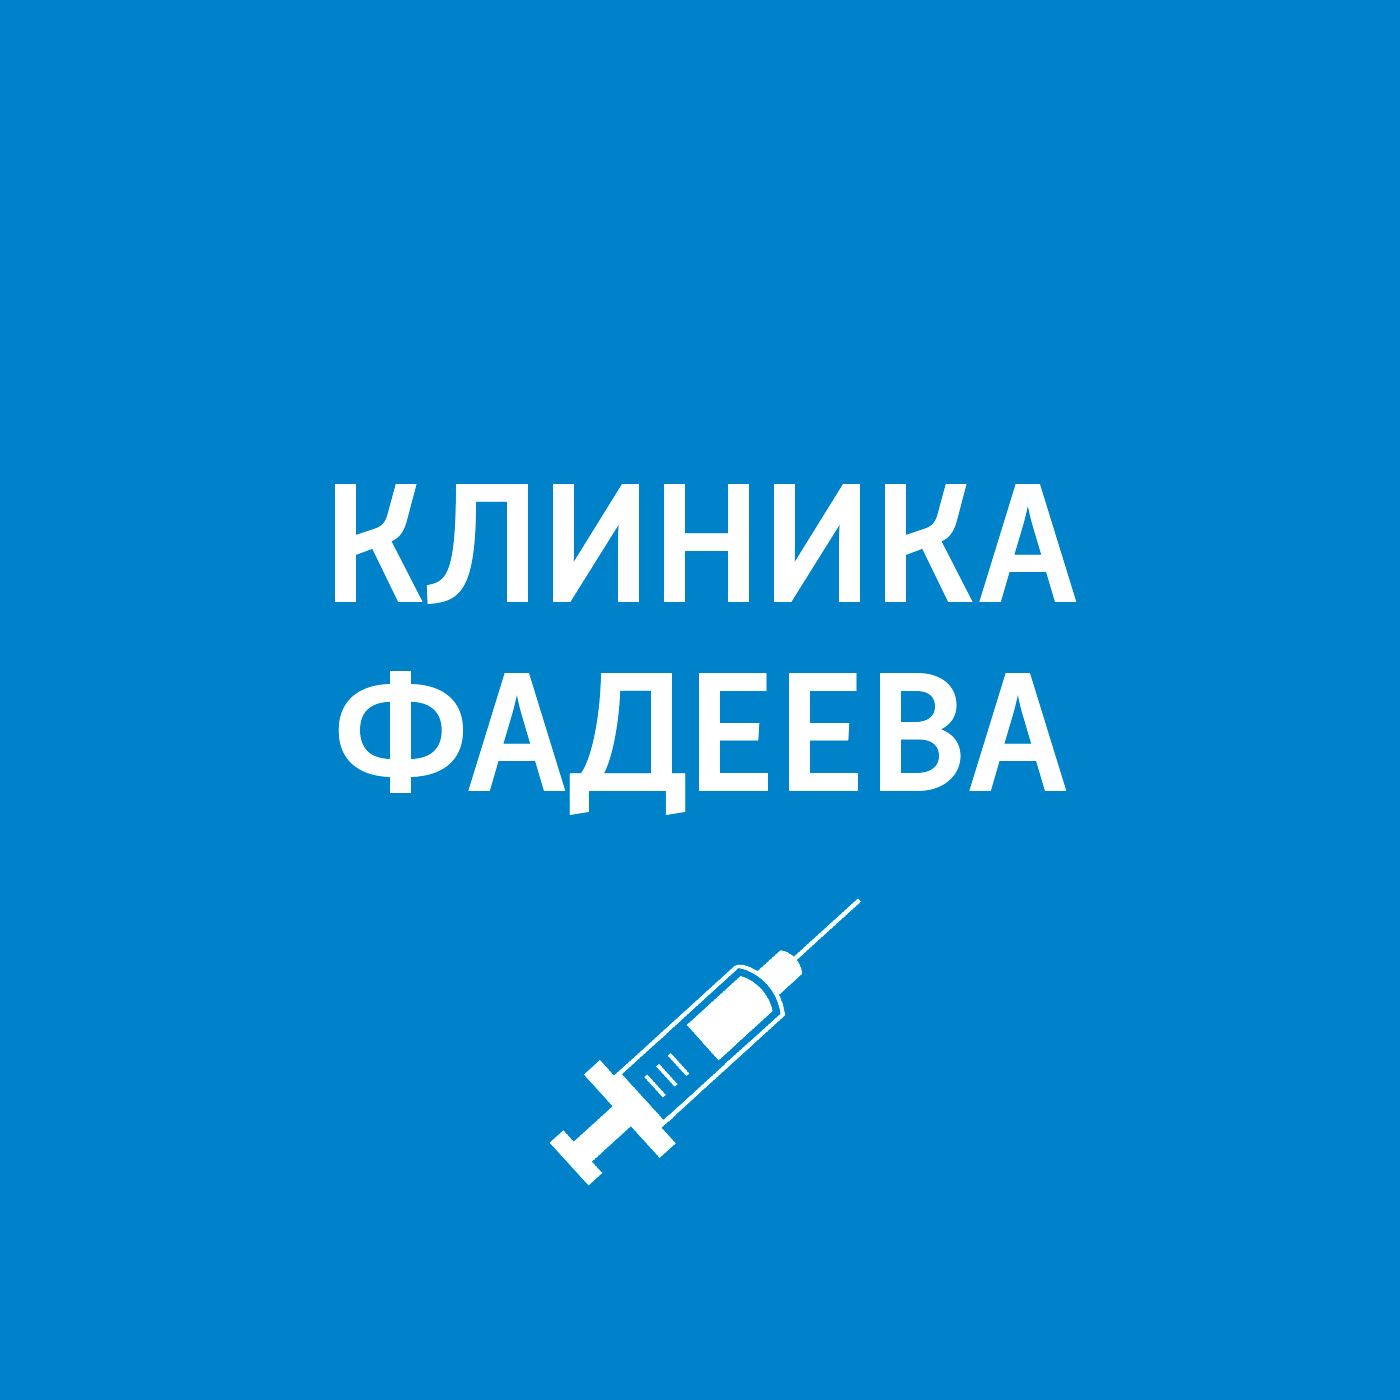 Пётр Фадеев Врач-диетолог цены онлайн